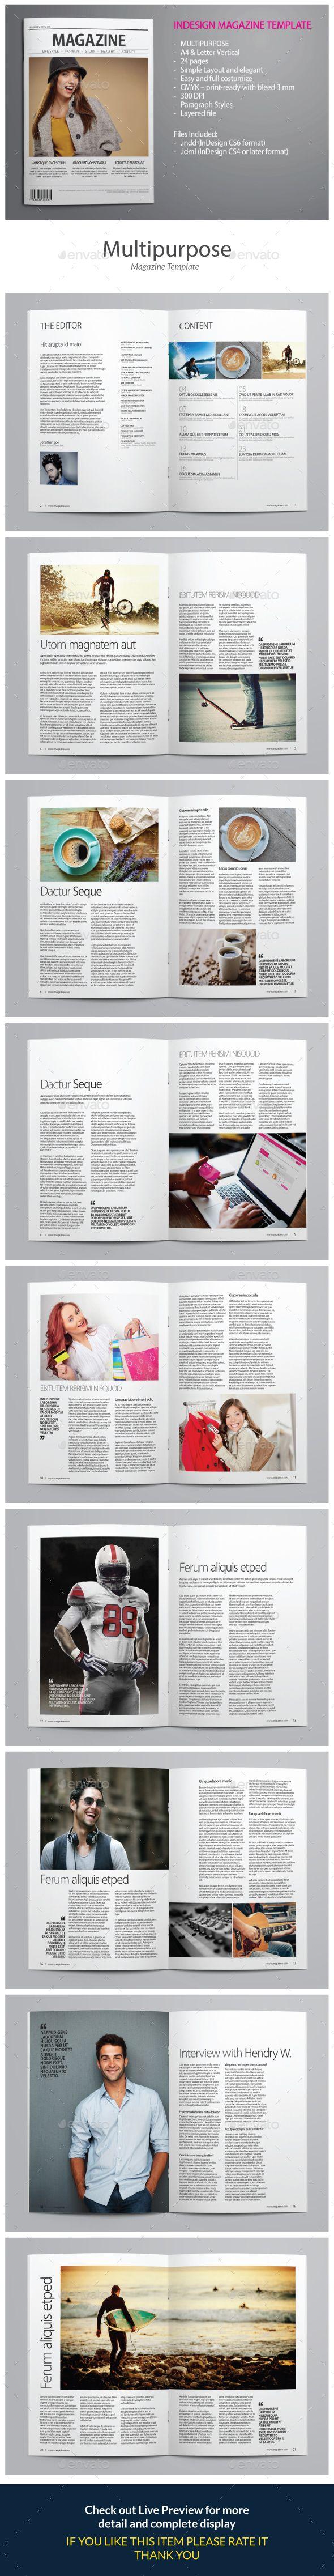 Indesign Magazine Template vol 5 | Revistas